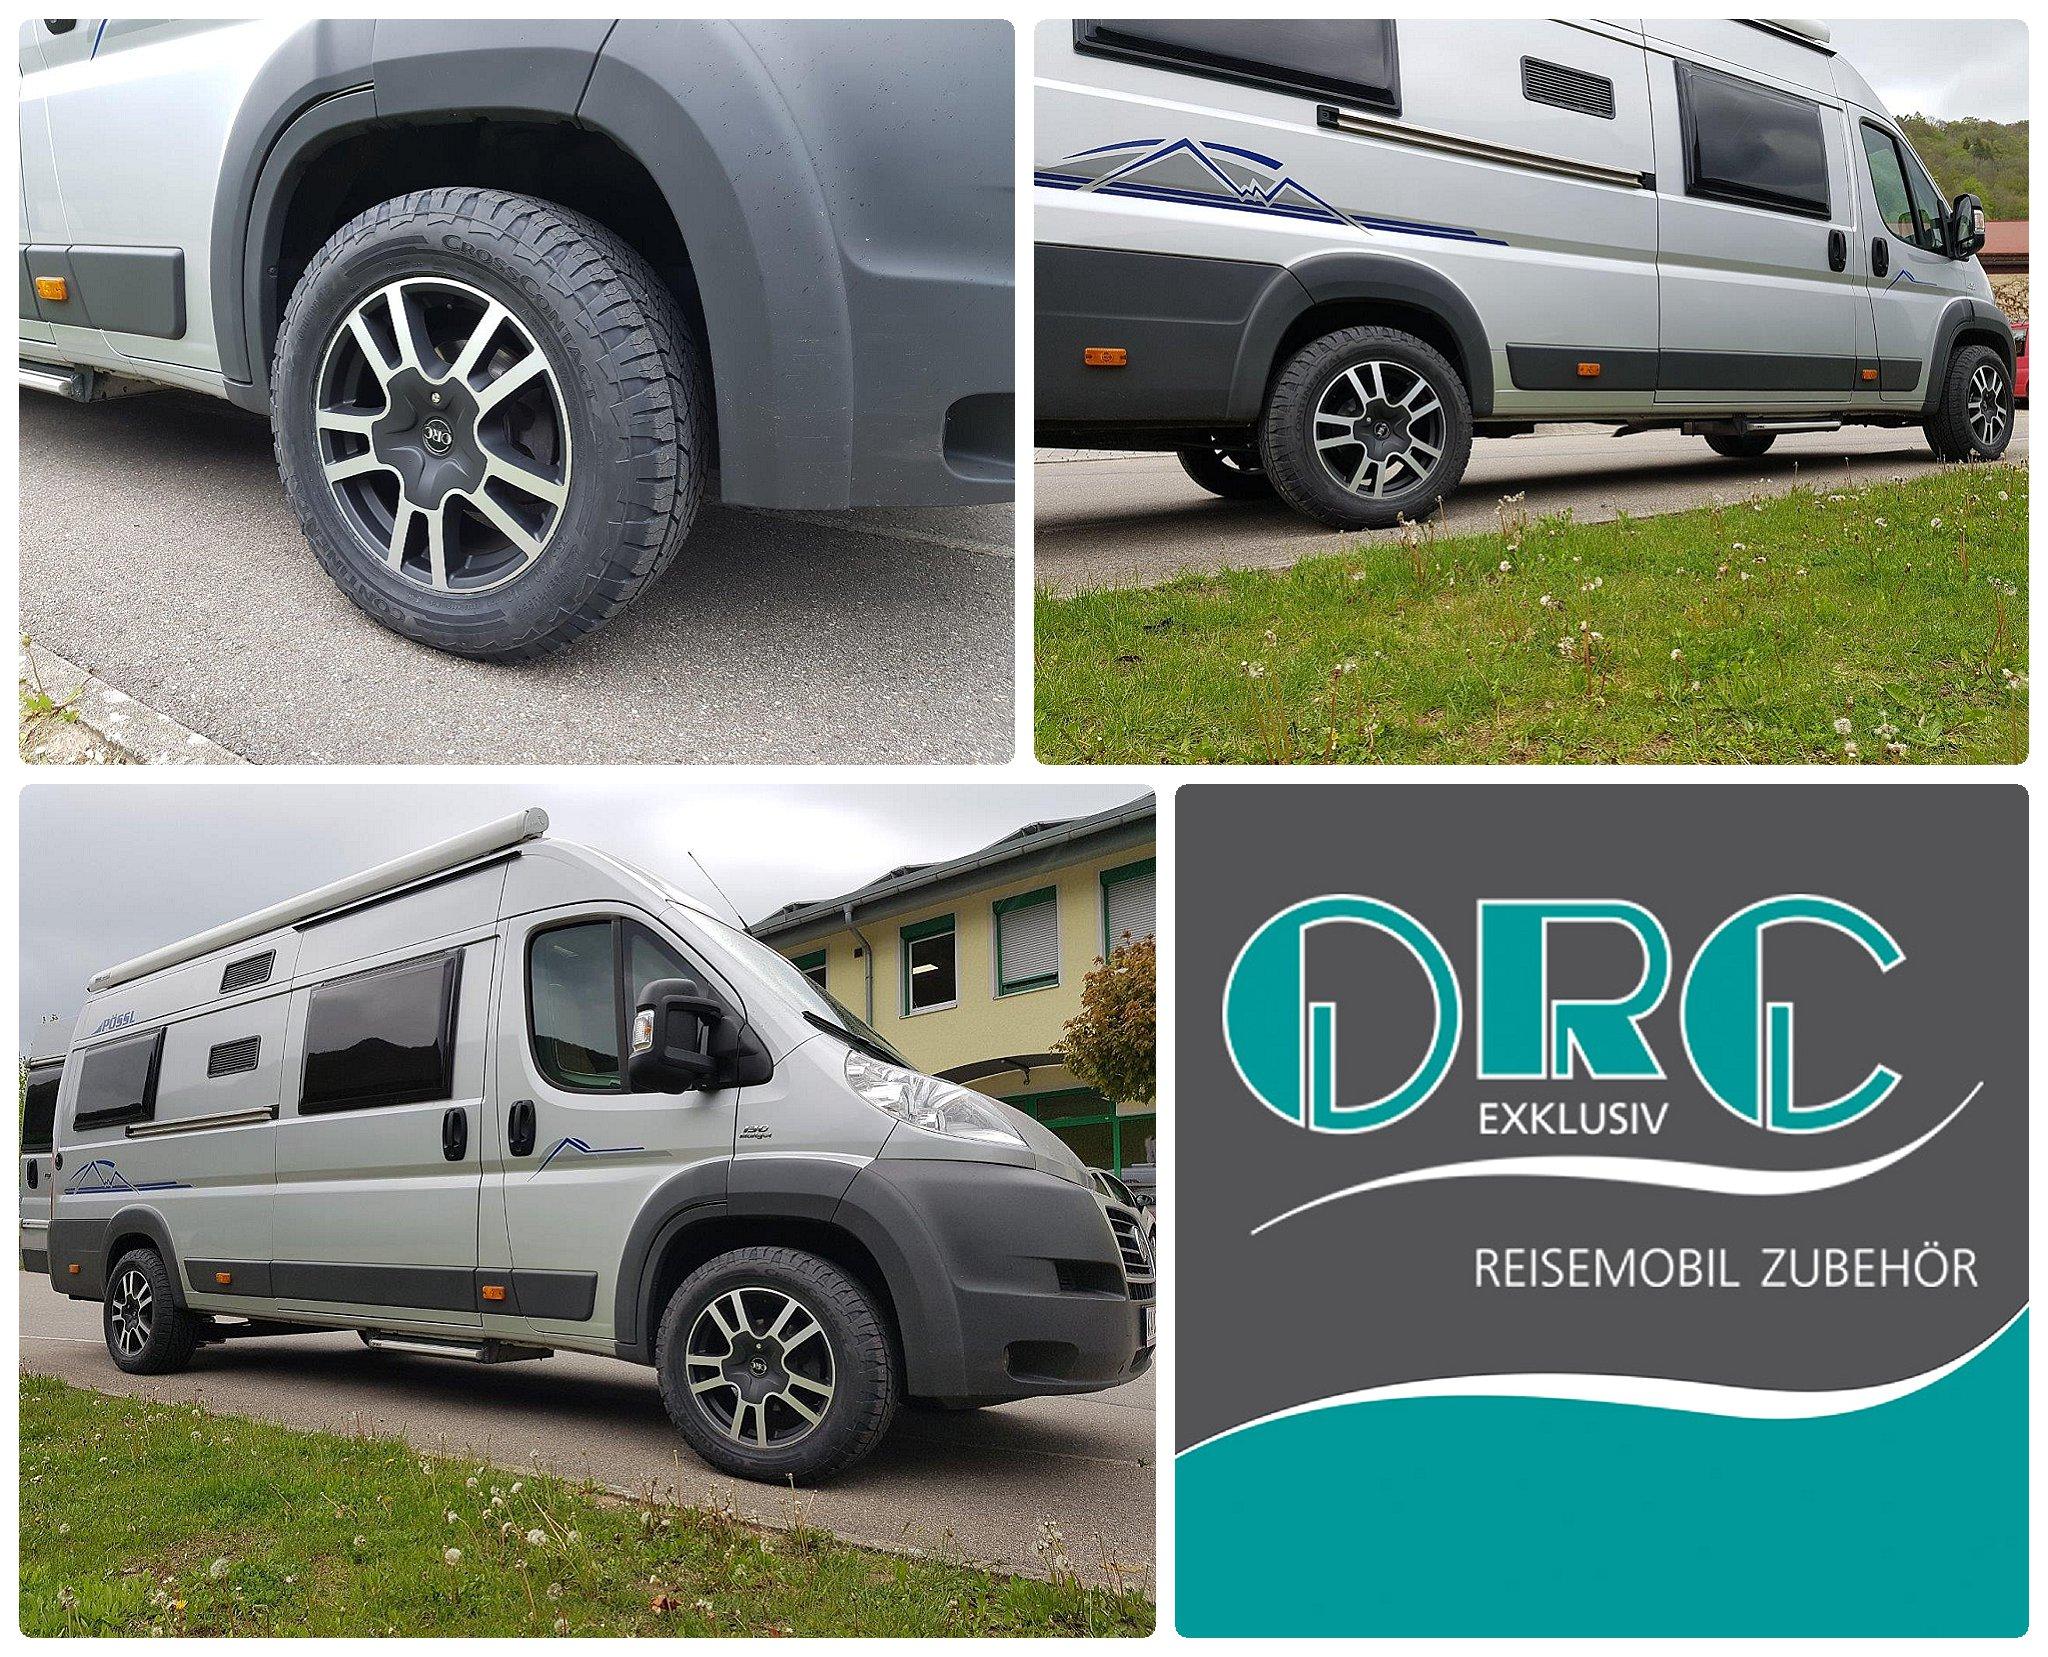 Roadcruiser mit ORC All Terrain Paket – ORC Exklusiv GmbH